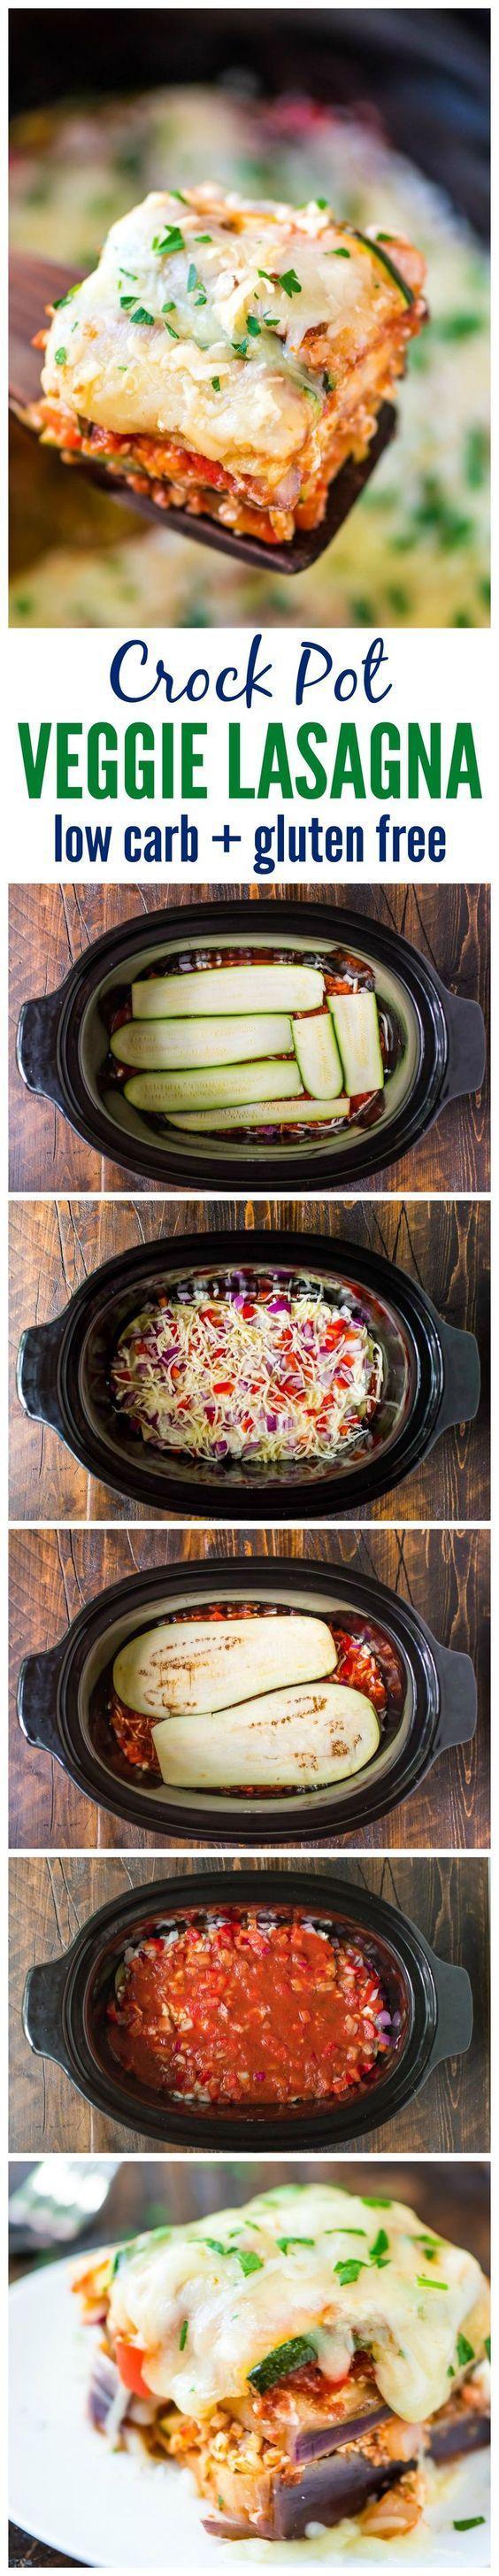 Clean Eating Crock Pot Low Carb Lasagna Recipe